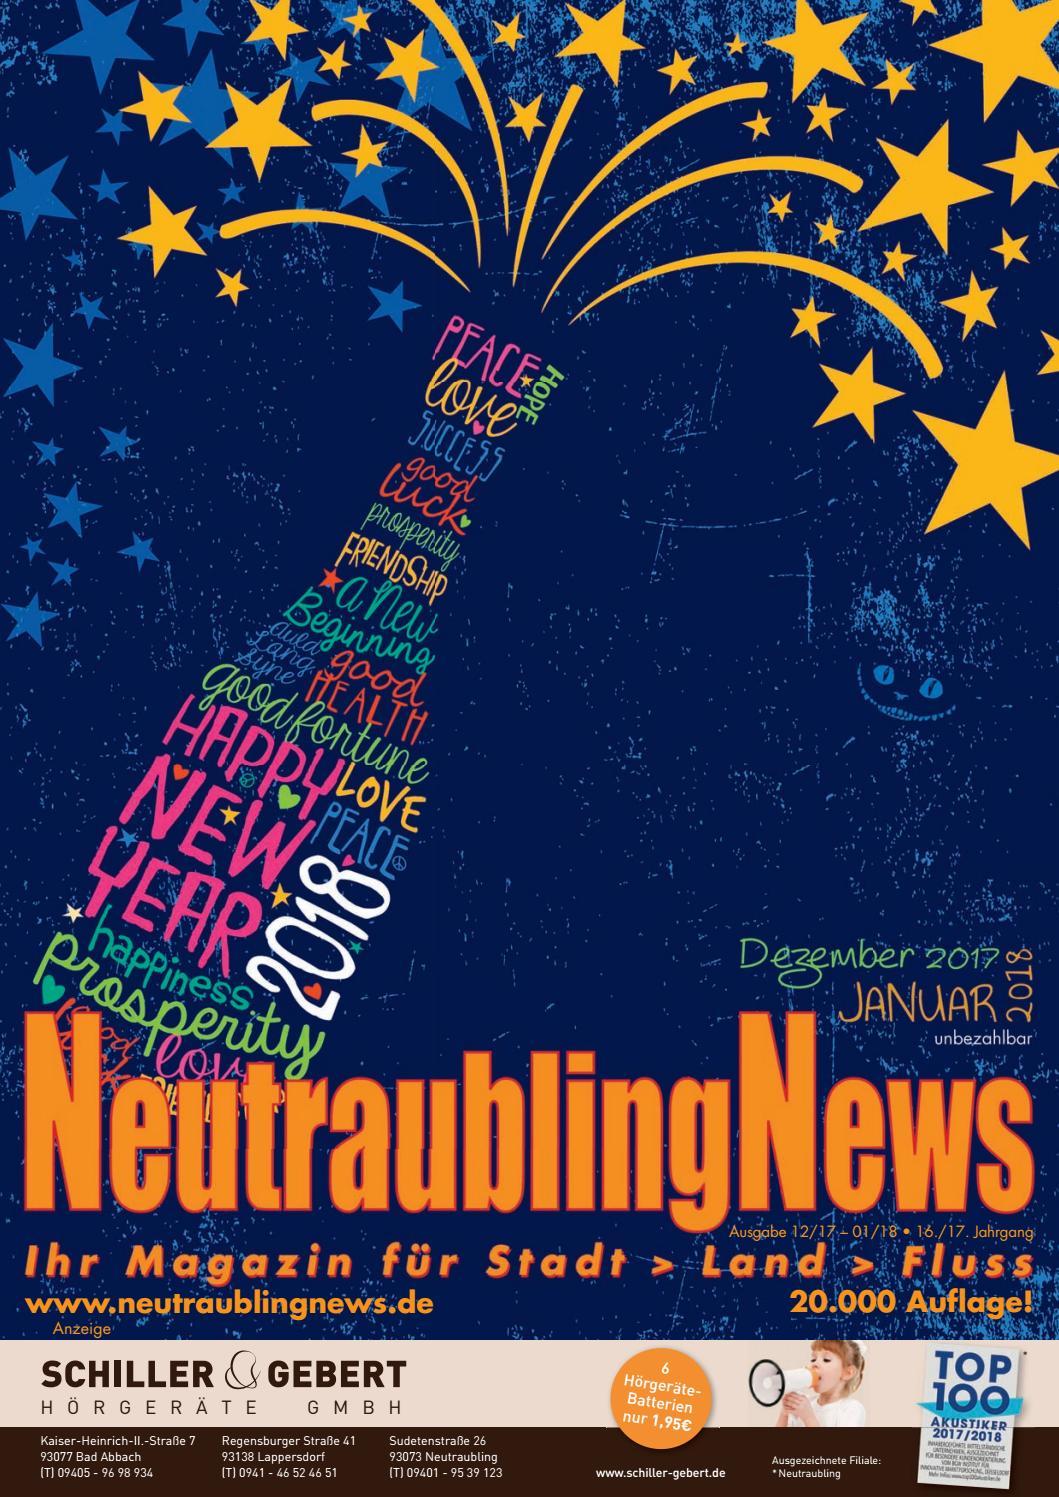 NeutraublingNews Dezember 2017 Januar2018 by Schnapp GmbH